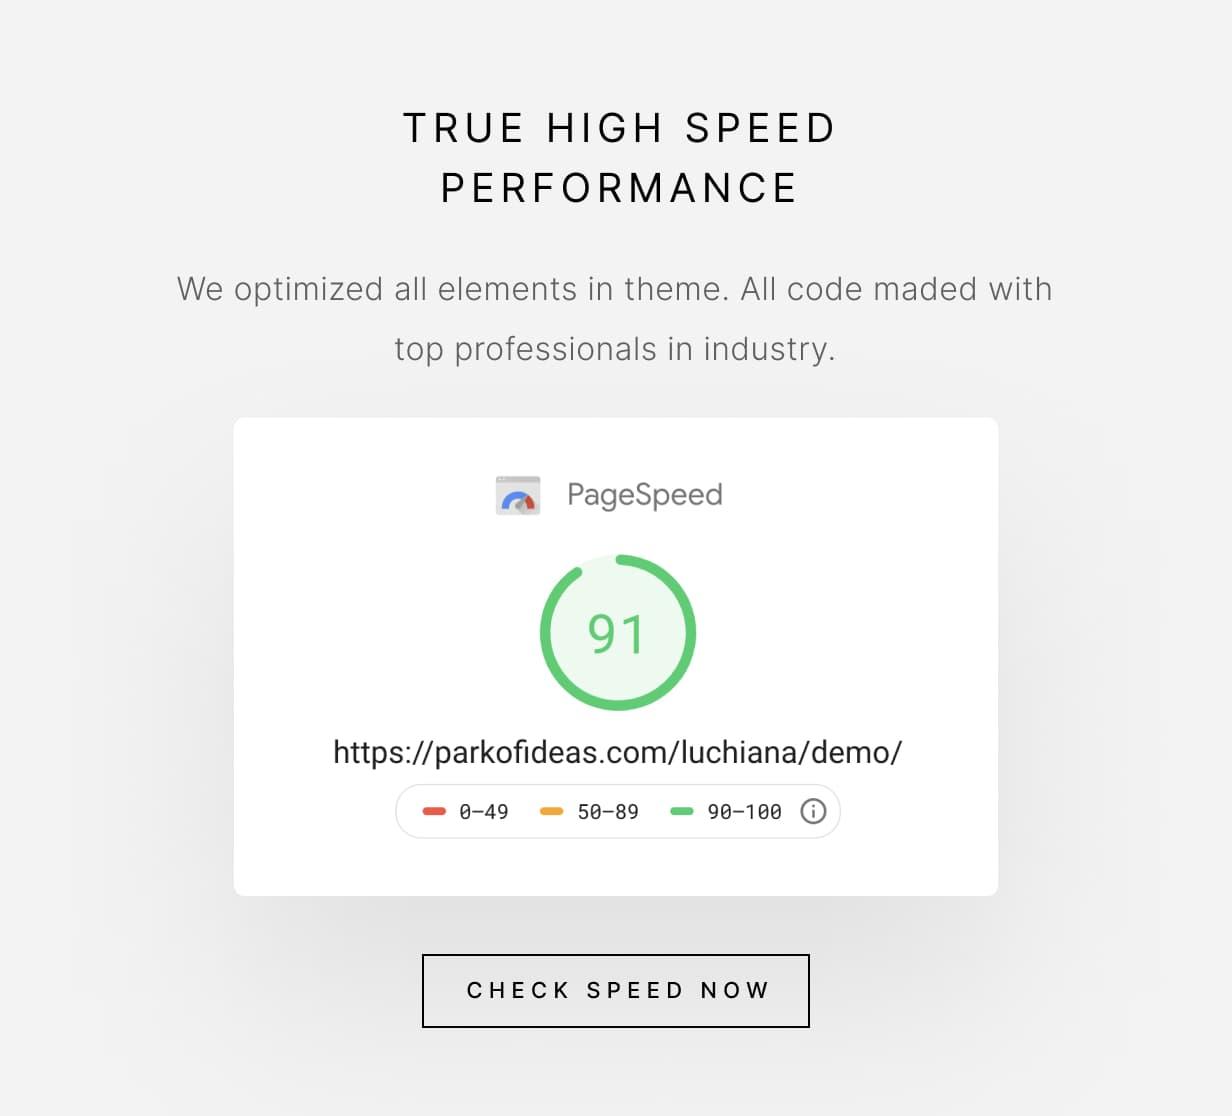 Luchiana - True High Speed Performance